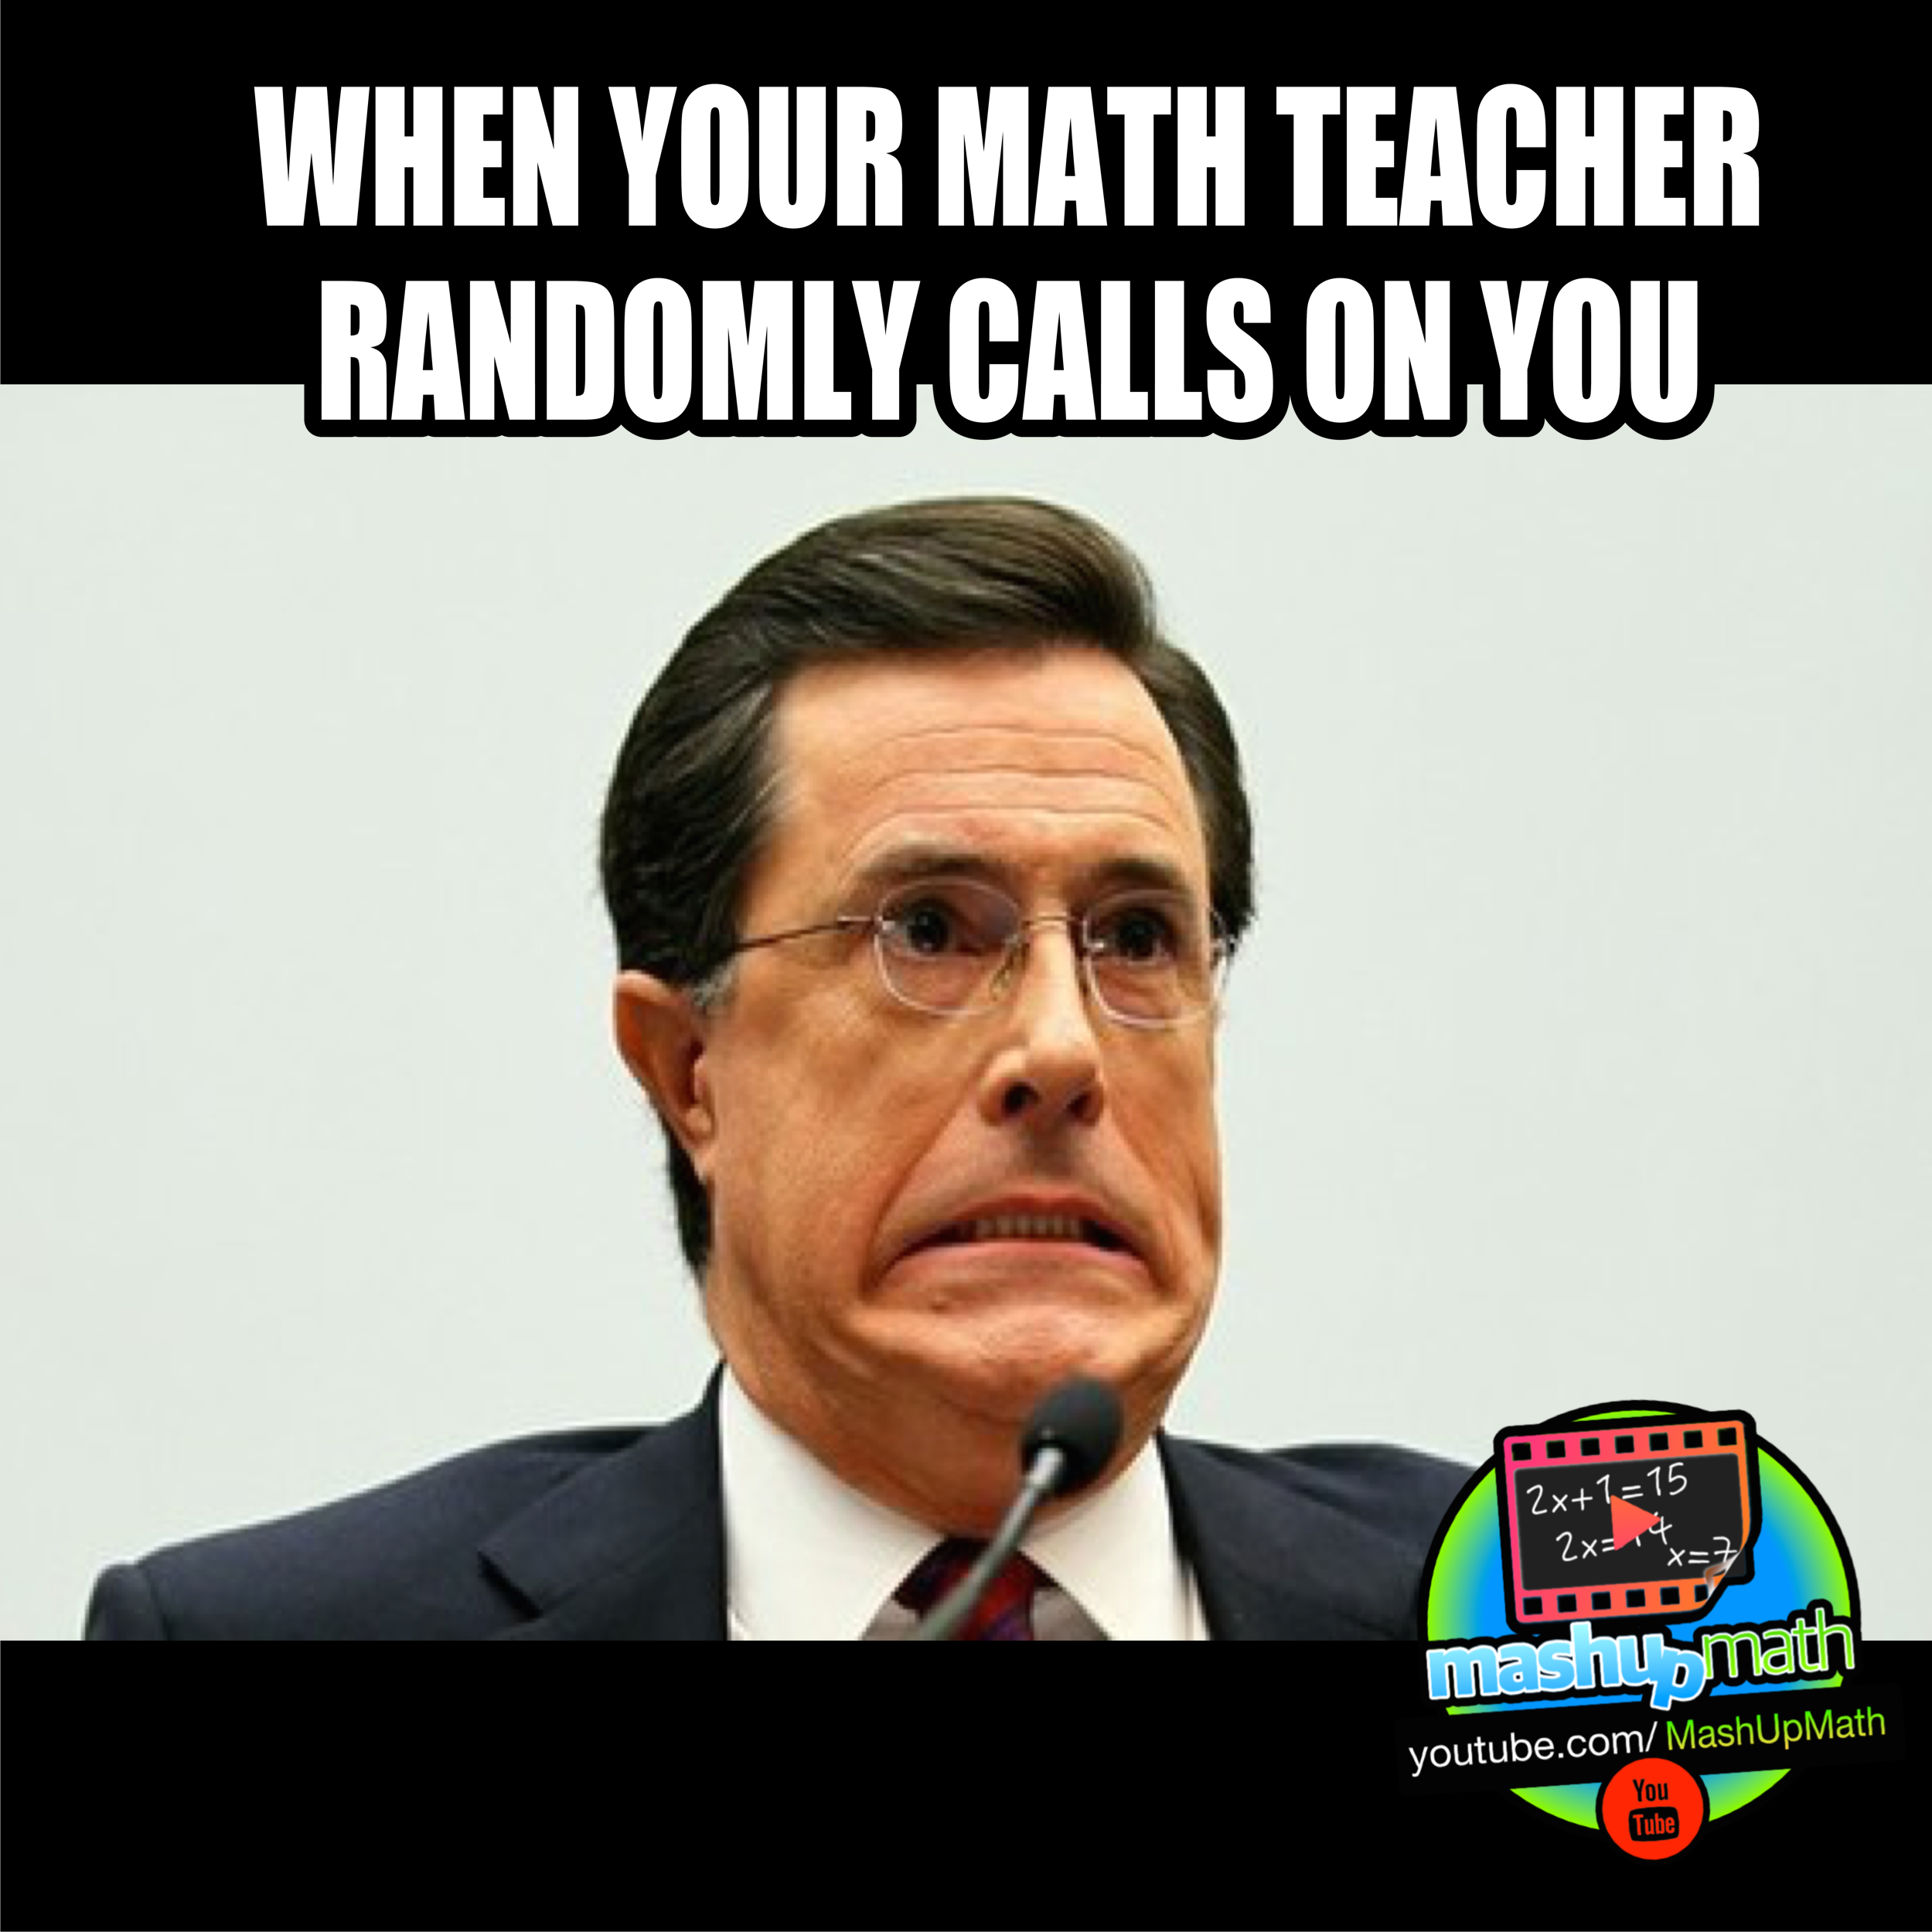 Follow Us On Instagram Mashupmath Mathmemes Lol Studentlife Teacherlife Meme Mathteacher Math Memes Classroom Quotes Classroom Memes